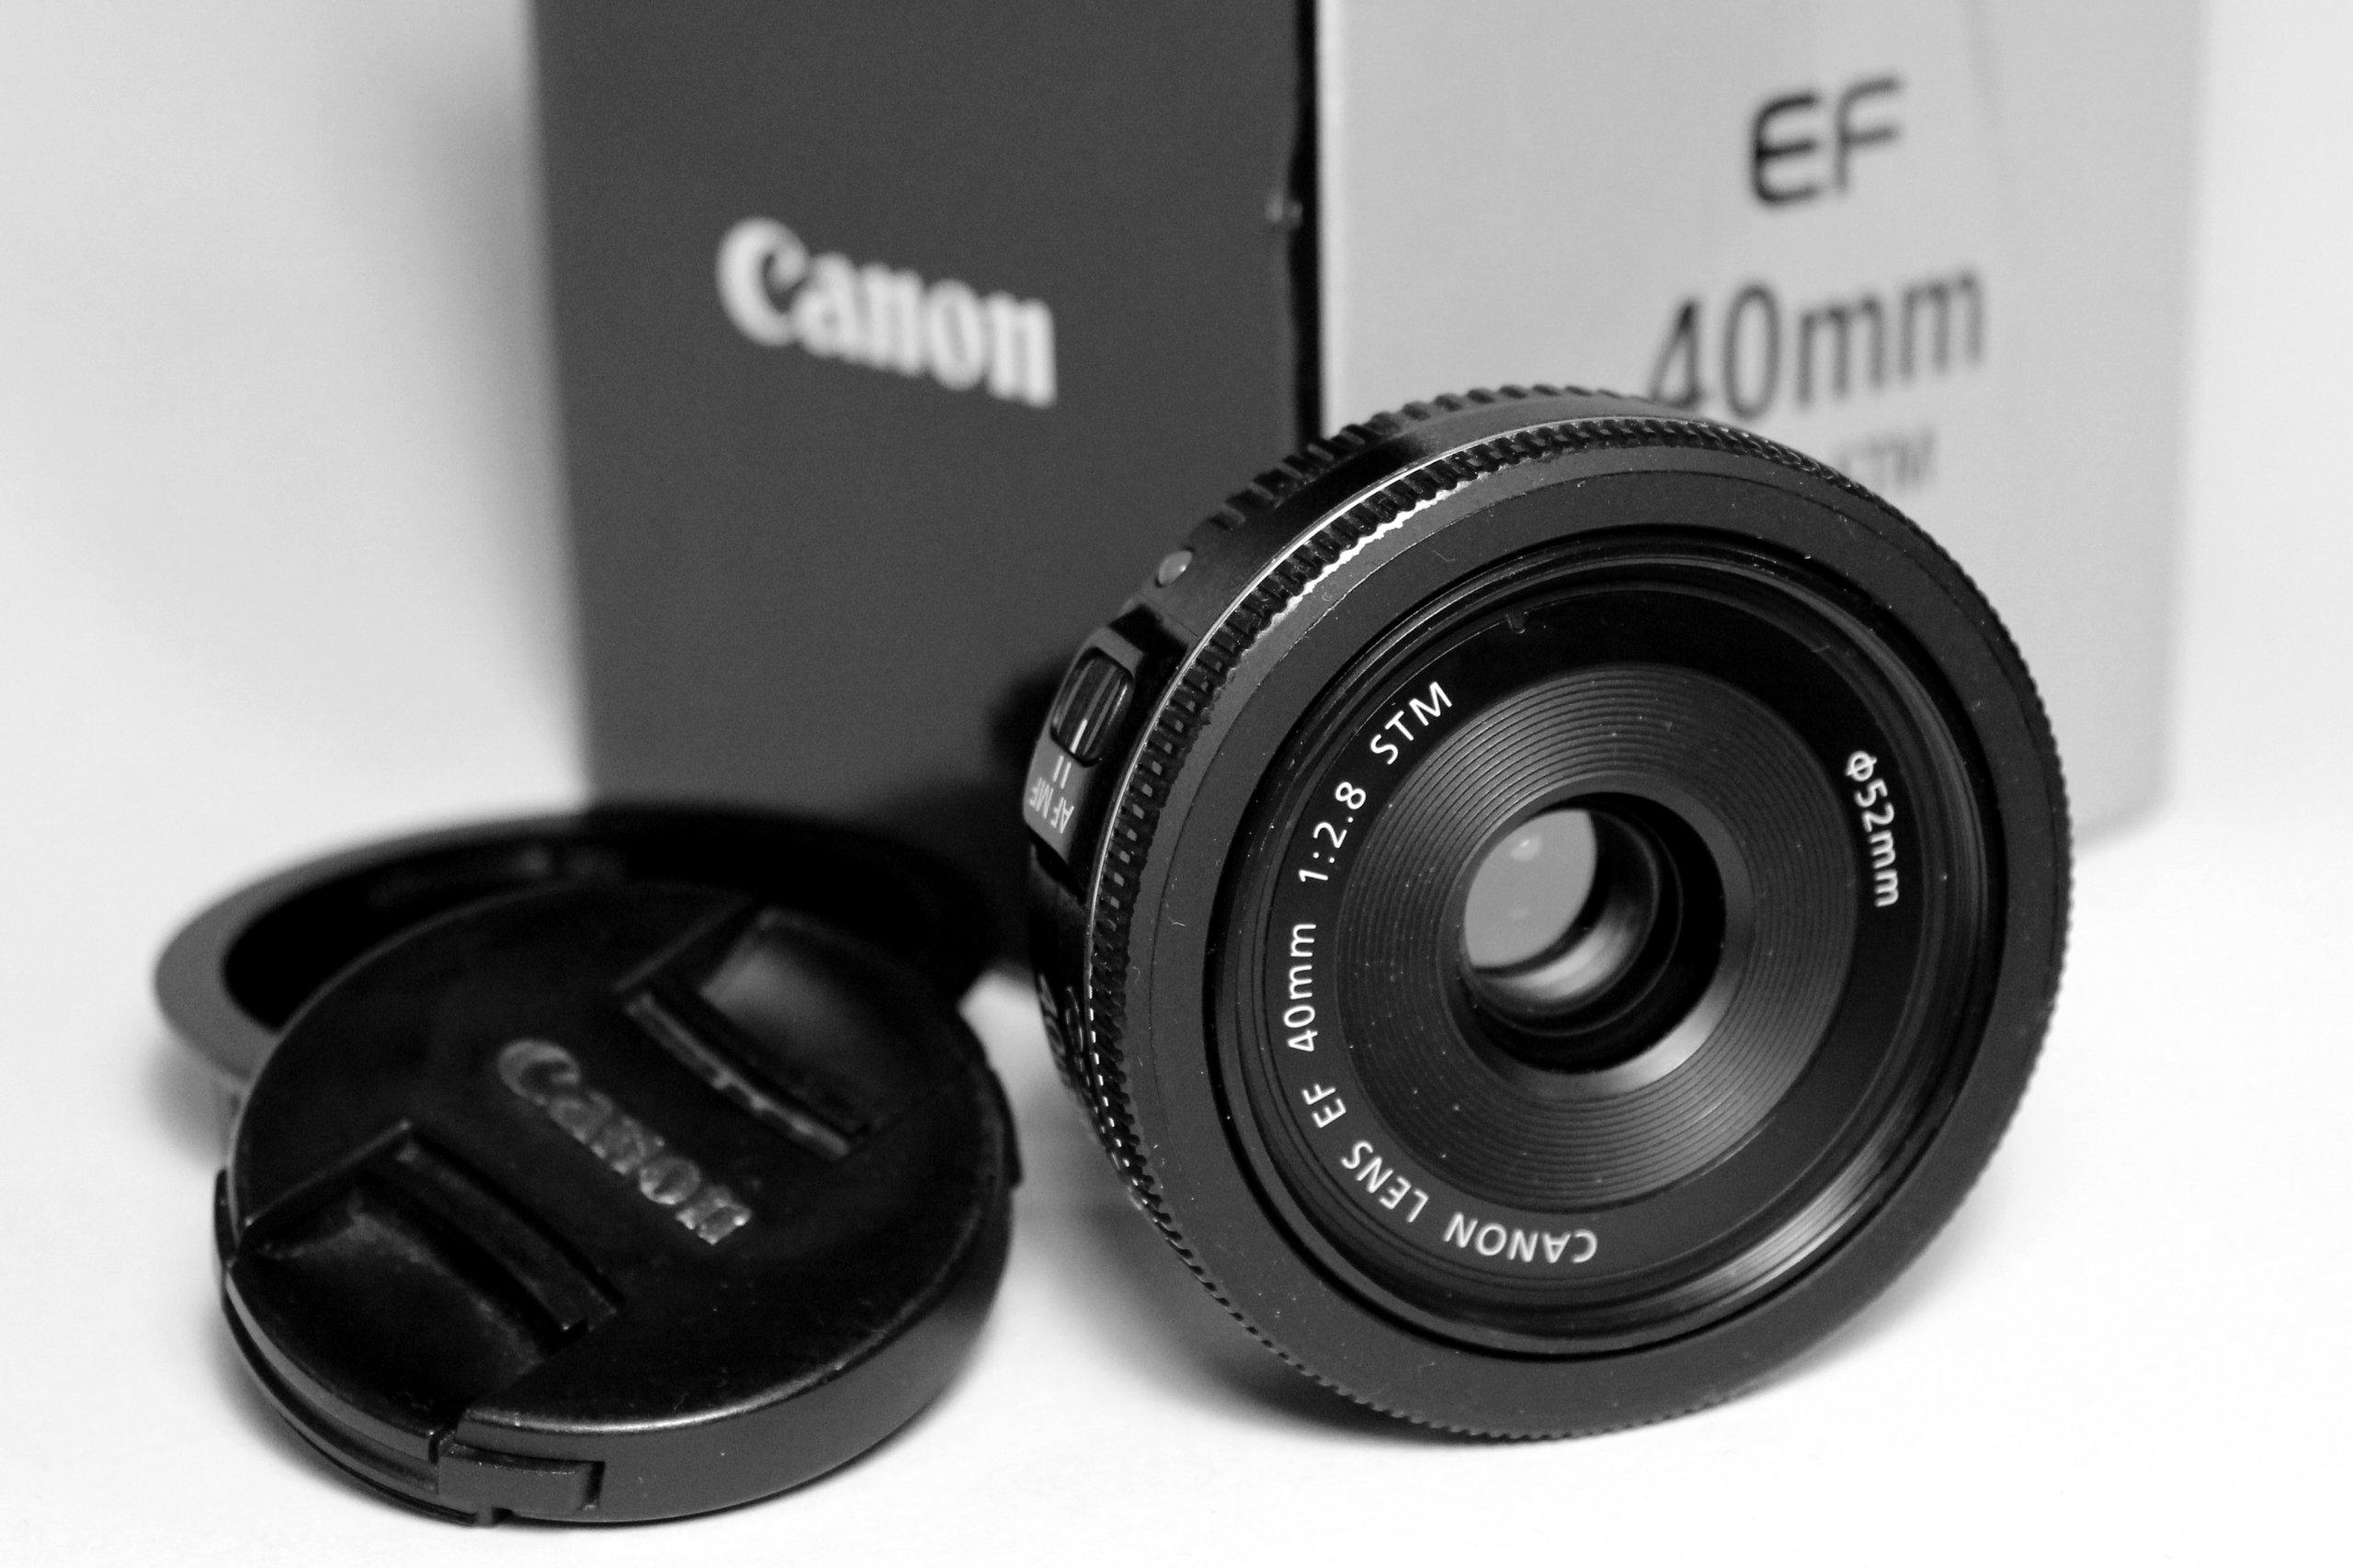 OBIEKTYW CANON 40mm f/2.8 EF STM PANCAKE